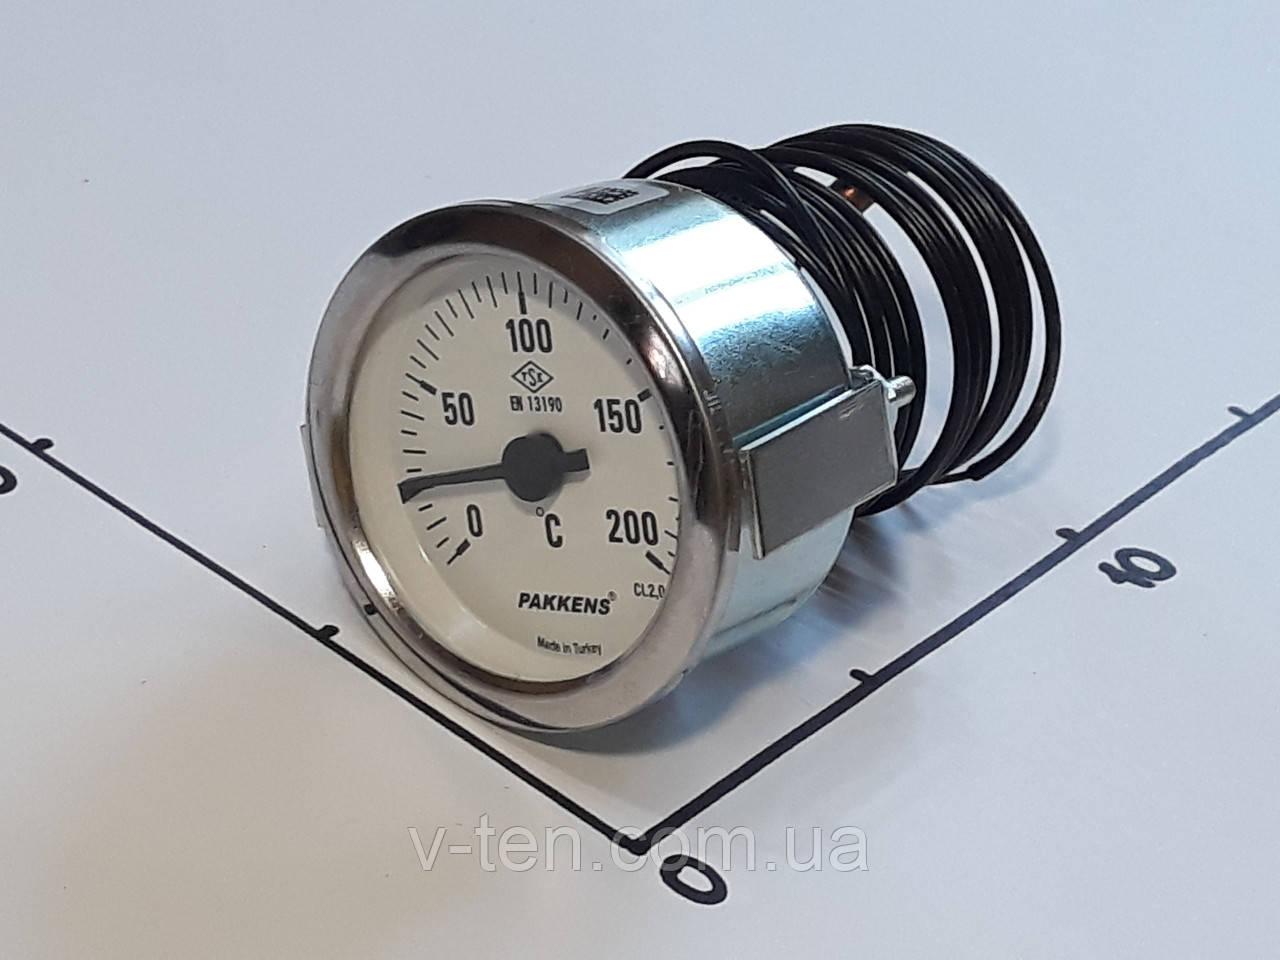 Термометр капиллярный Ø60мм / 200°С / L-200 cм PAKKENS (Турция)